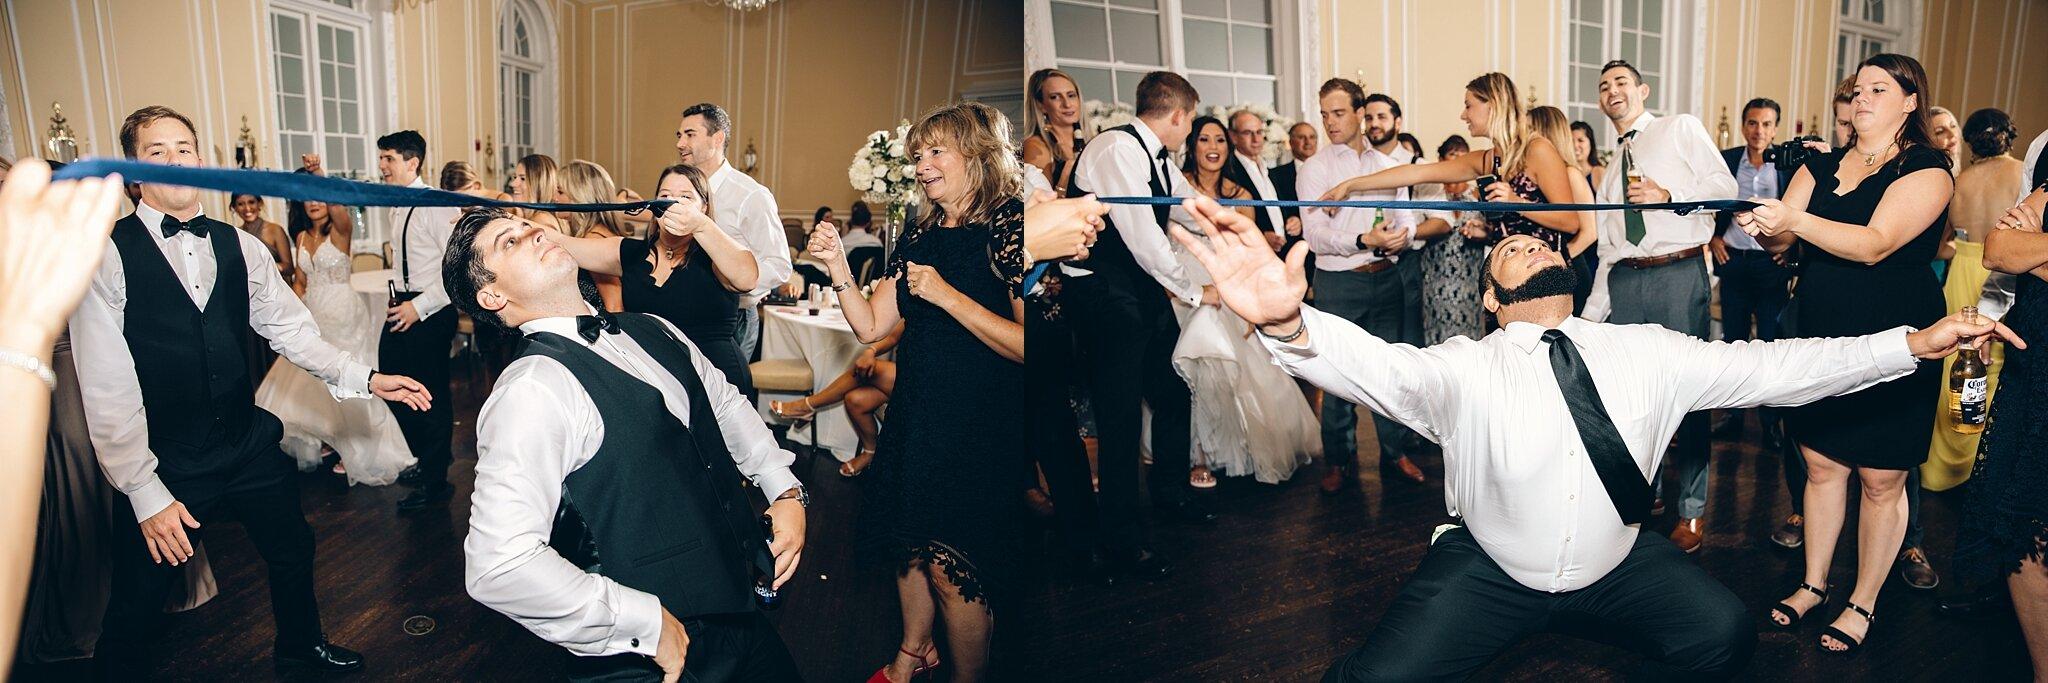 patrick-henry-ballroom-wedding-roanoke_0572.jpg